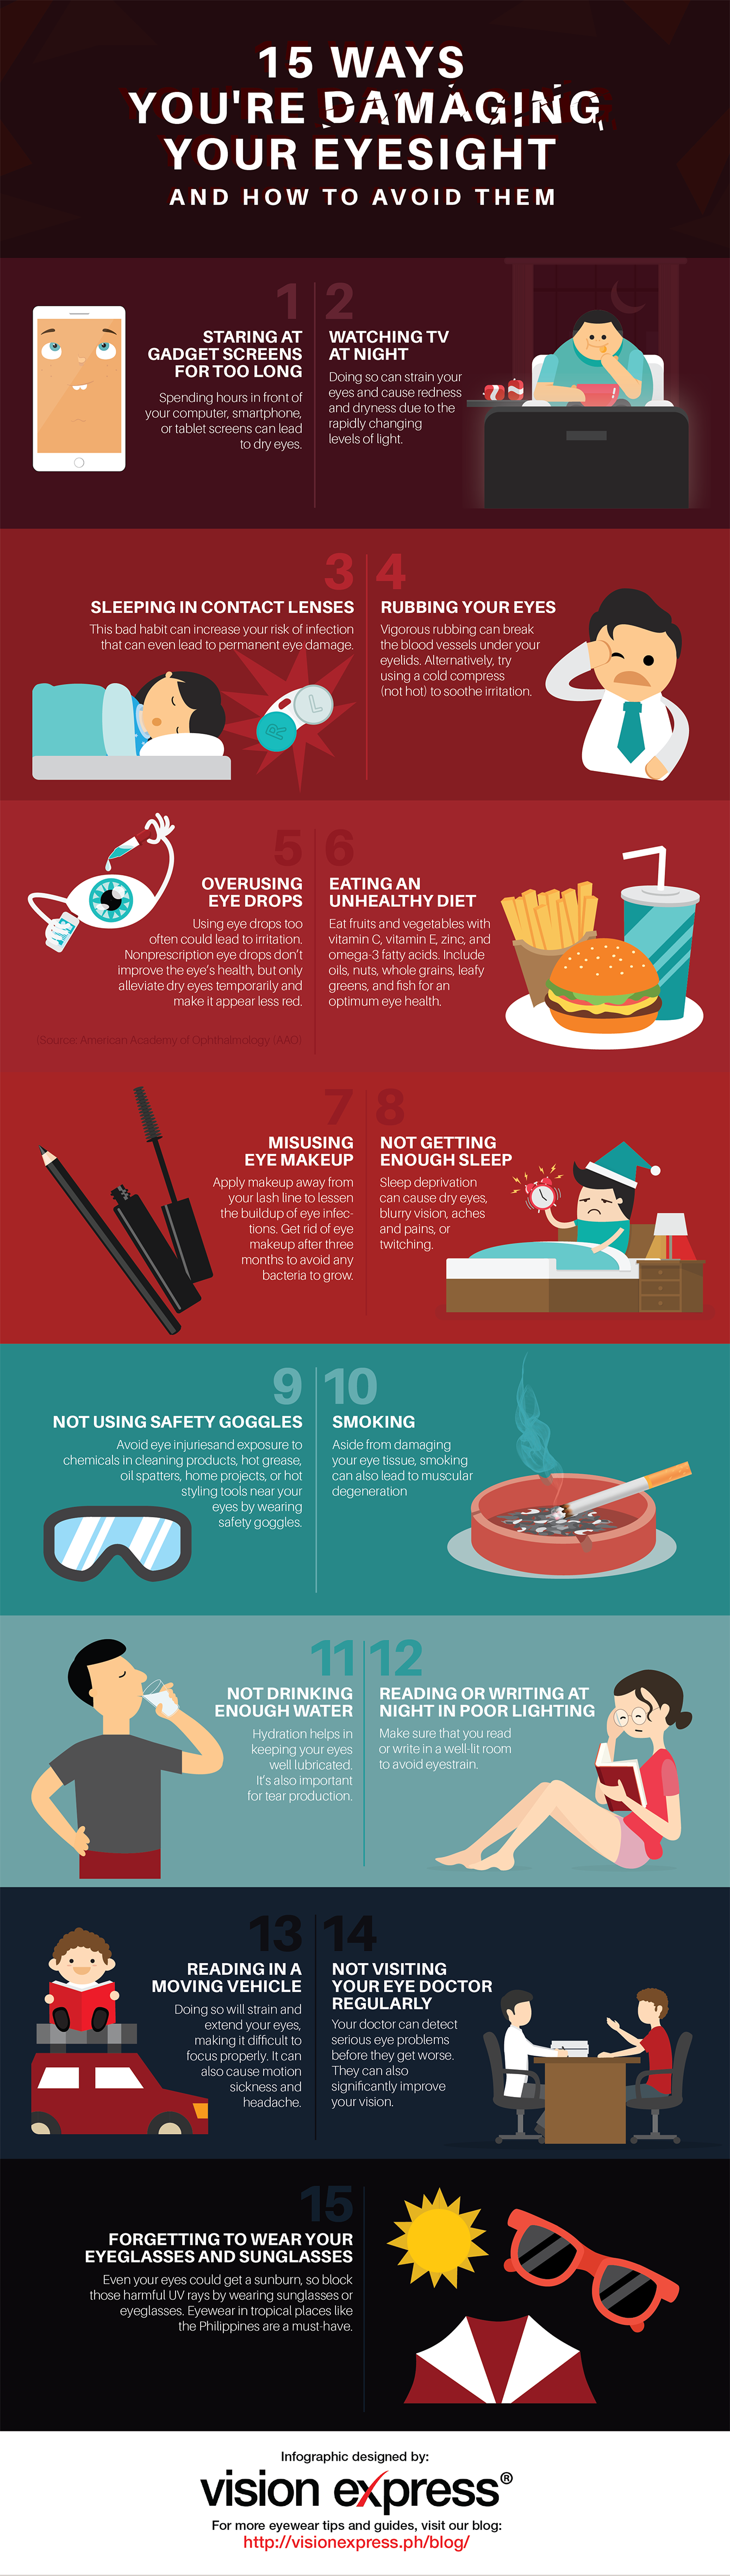 15 Ways You're Damaging Your Eyesight Without Realizing It Infographic